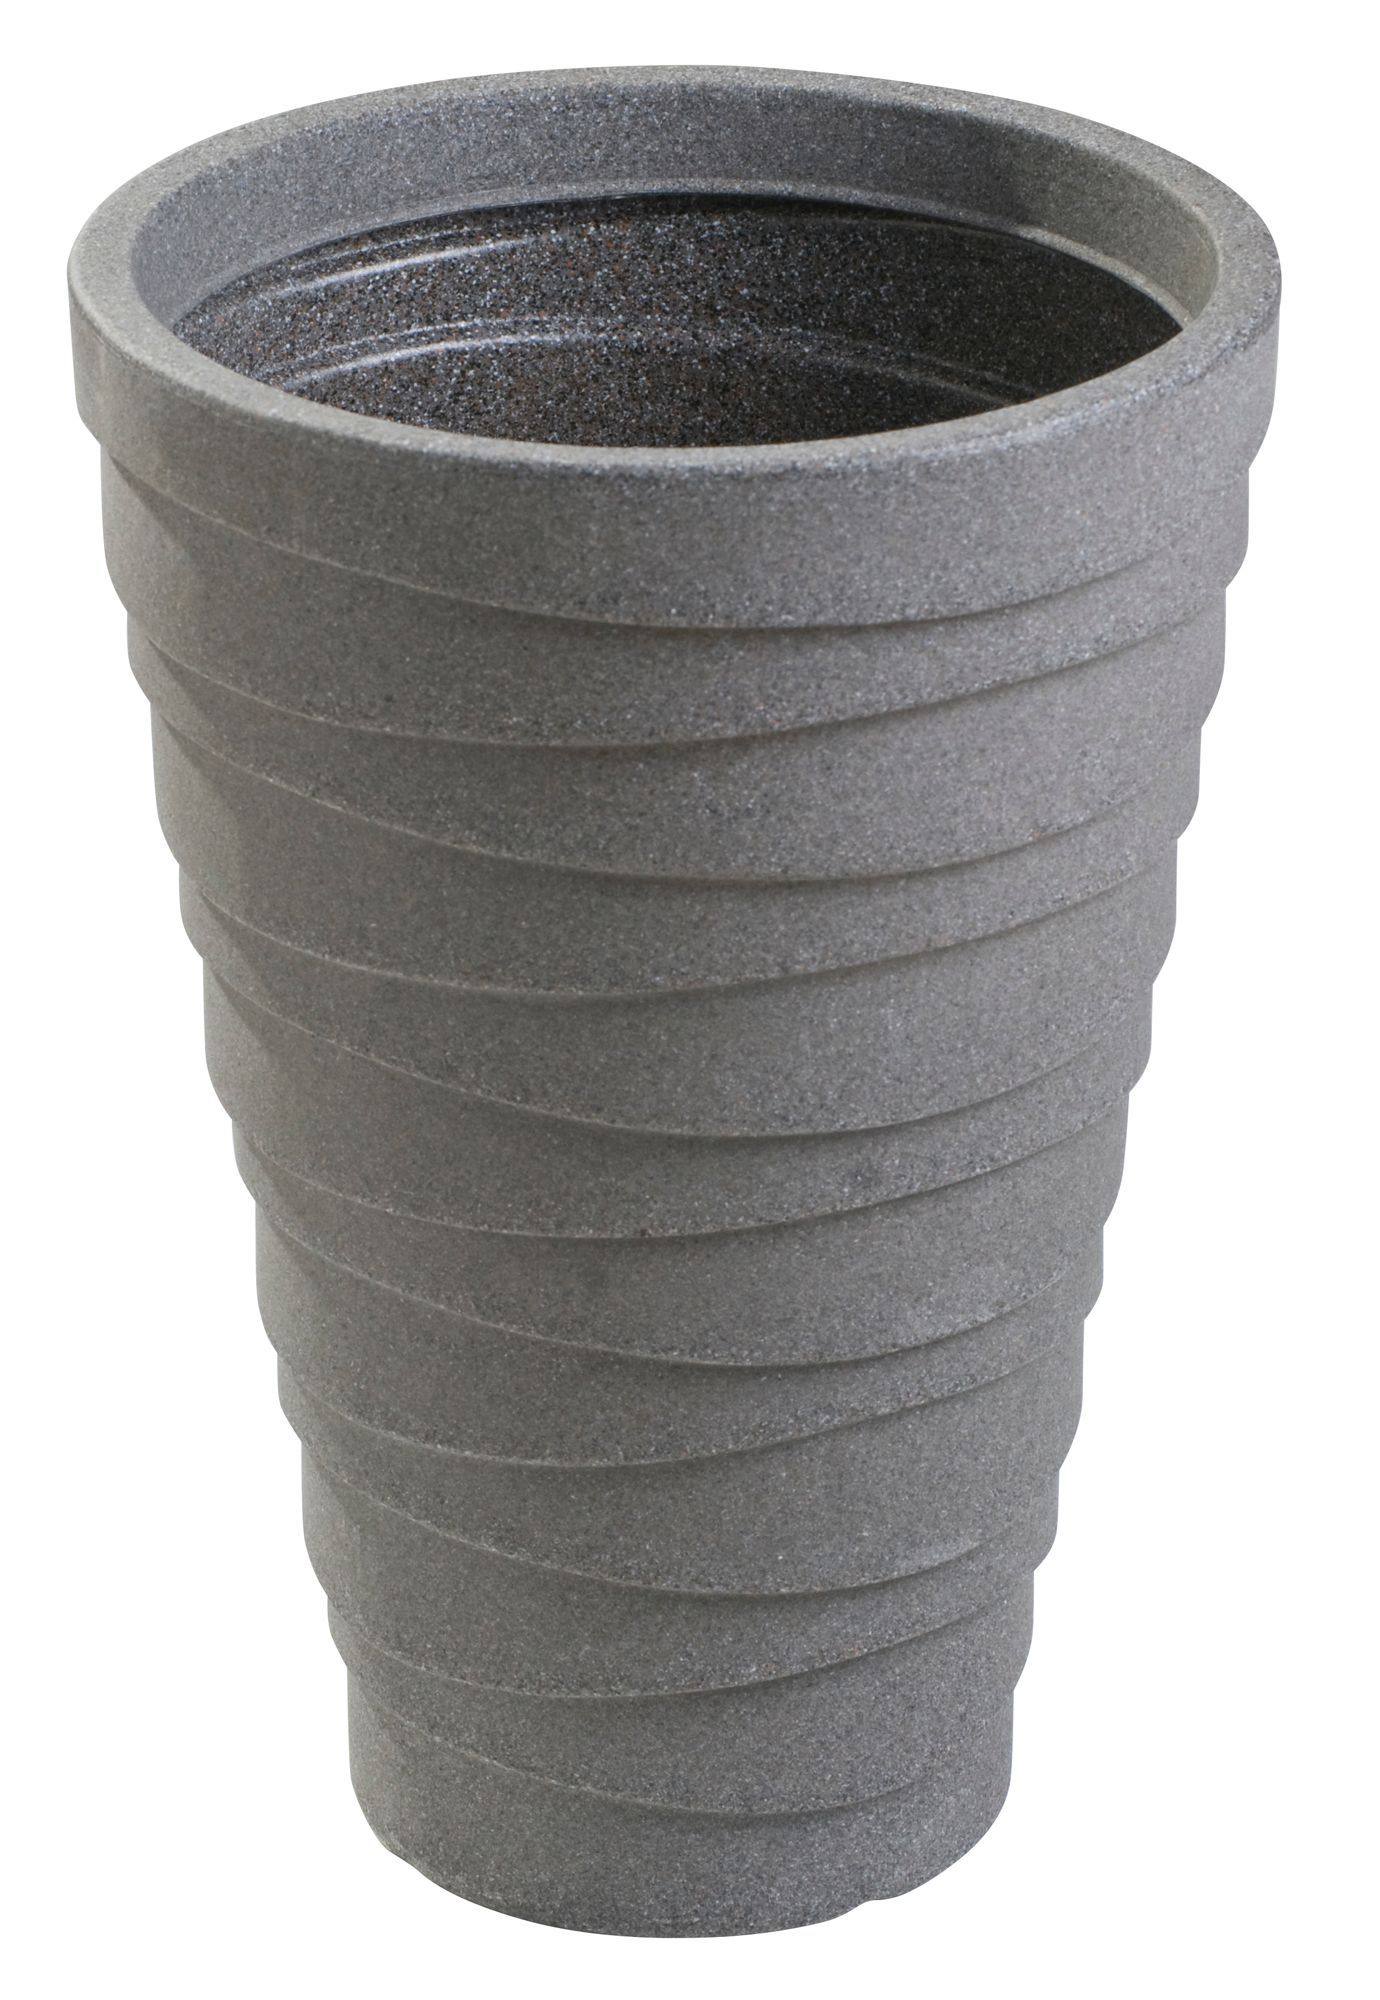 Trojan Round Plastic Pot H 560mm Dia 380mm Departments